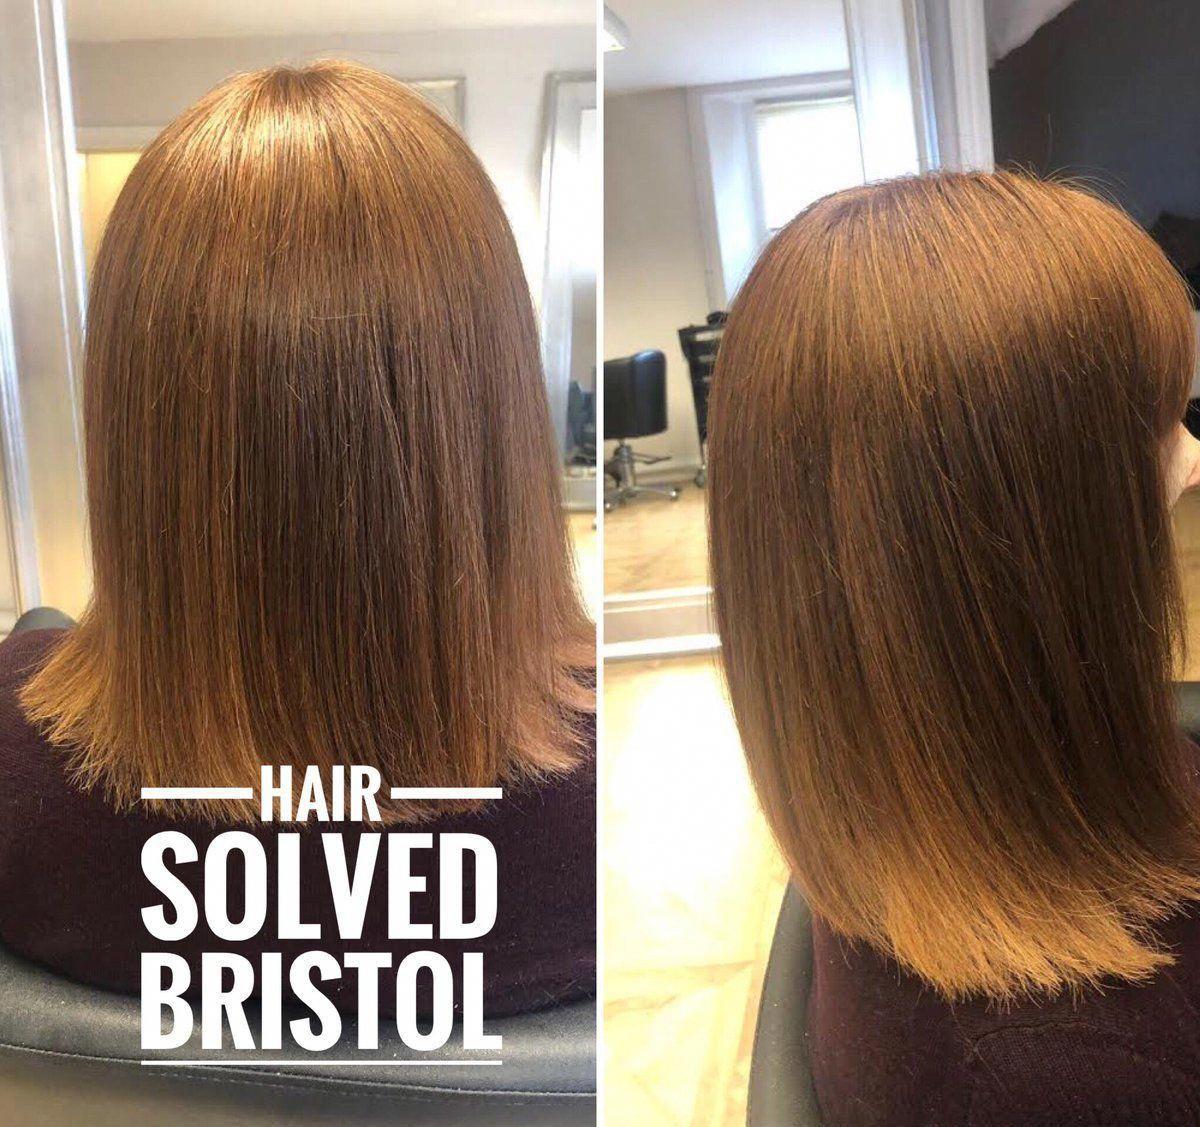 Hair Loss Solution Bristol In 2020 Hair Loss Women Natural Hair Loss Treatment Hair Loss Specialist